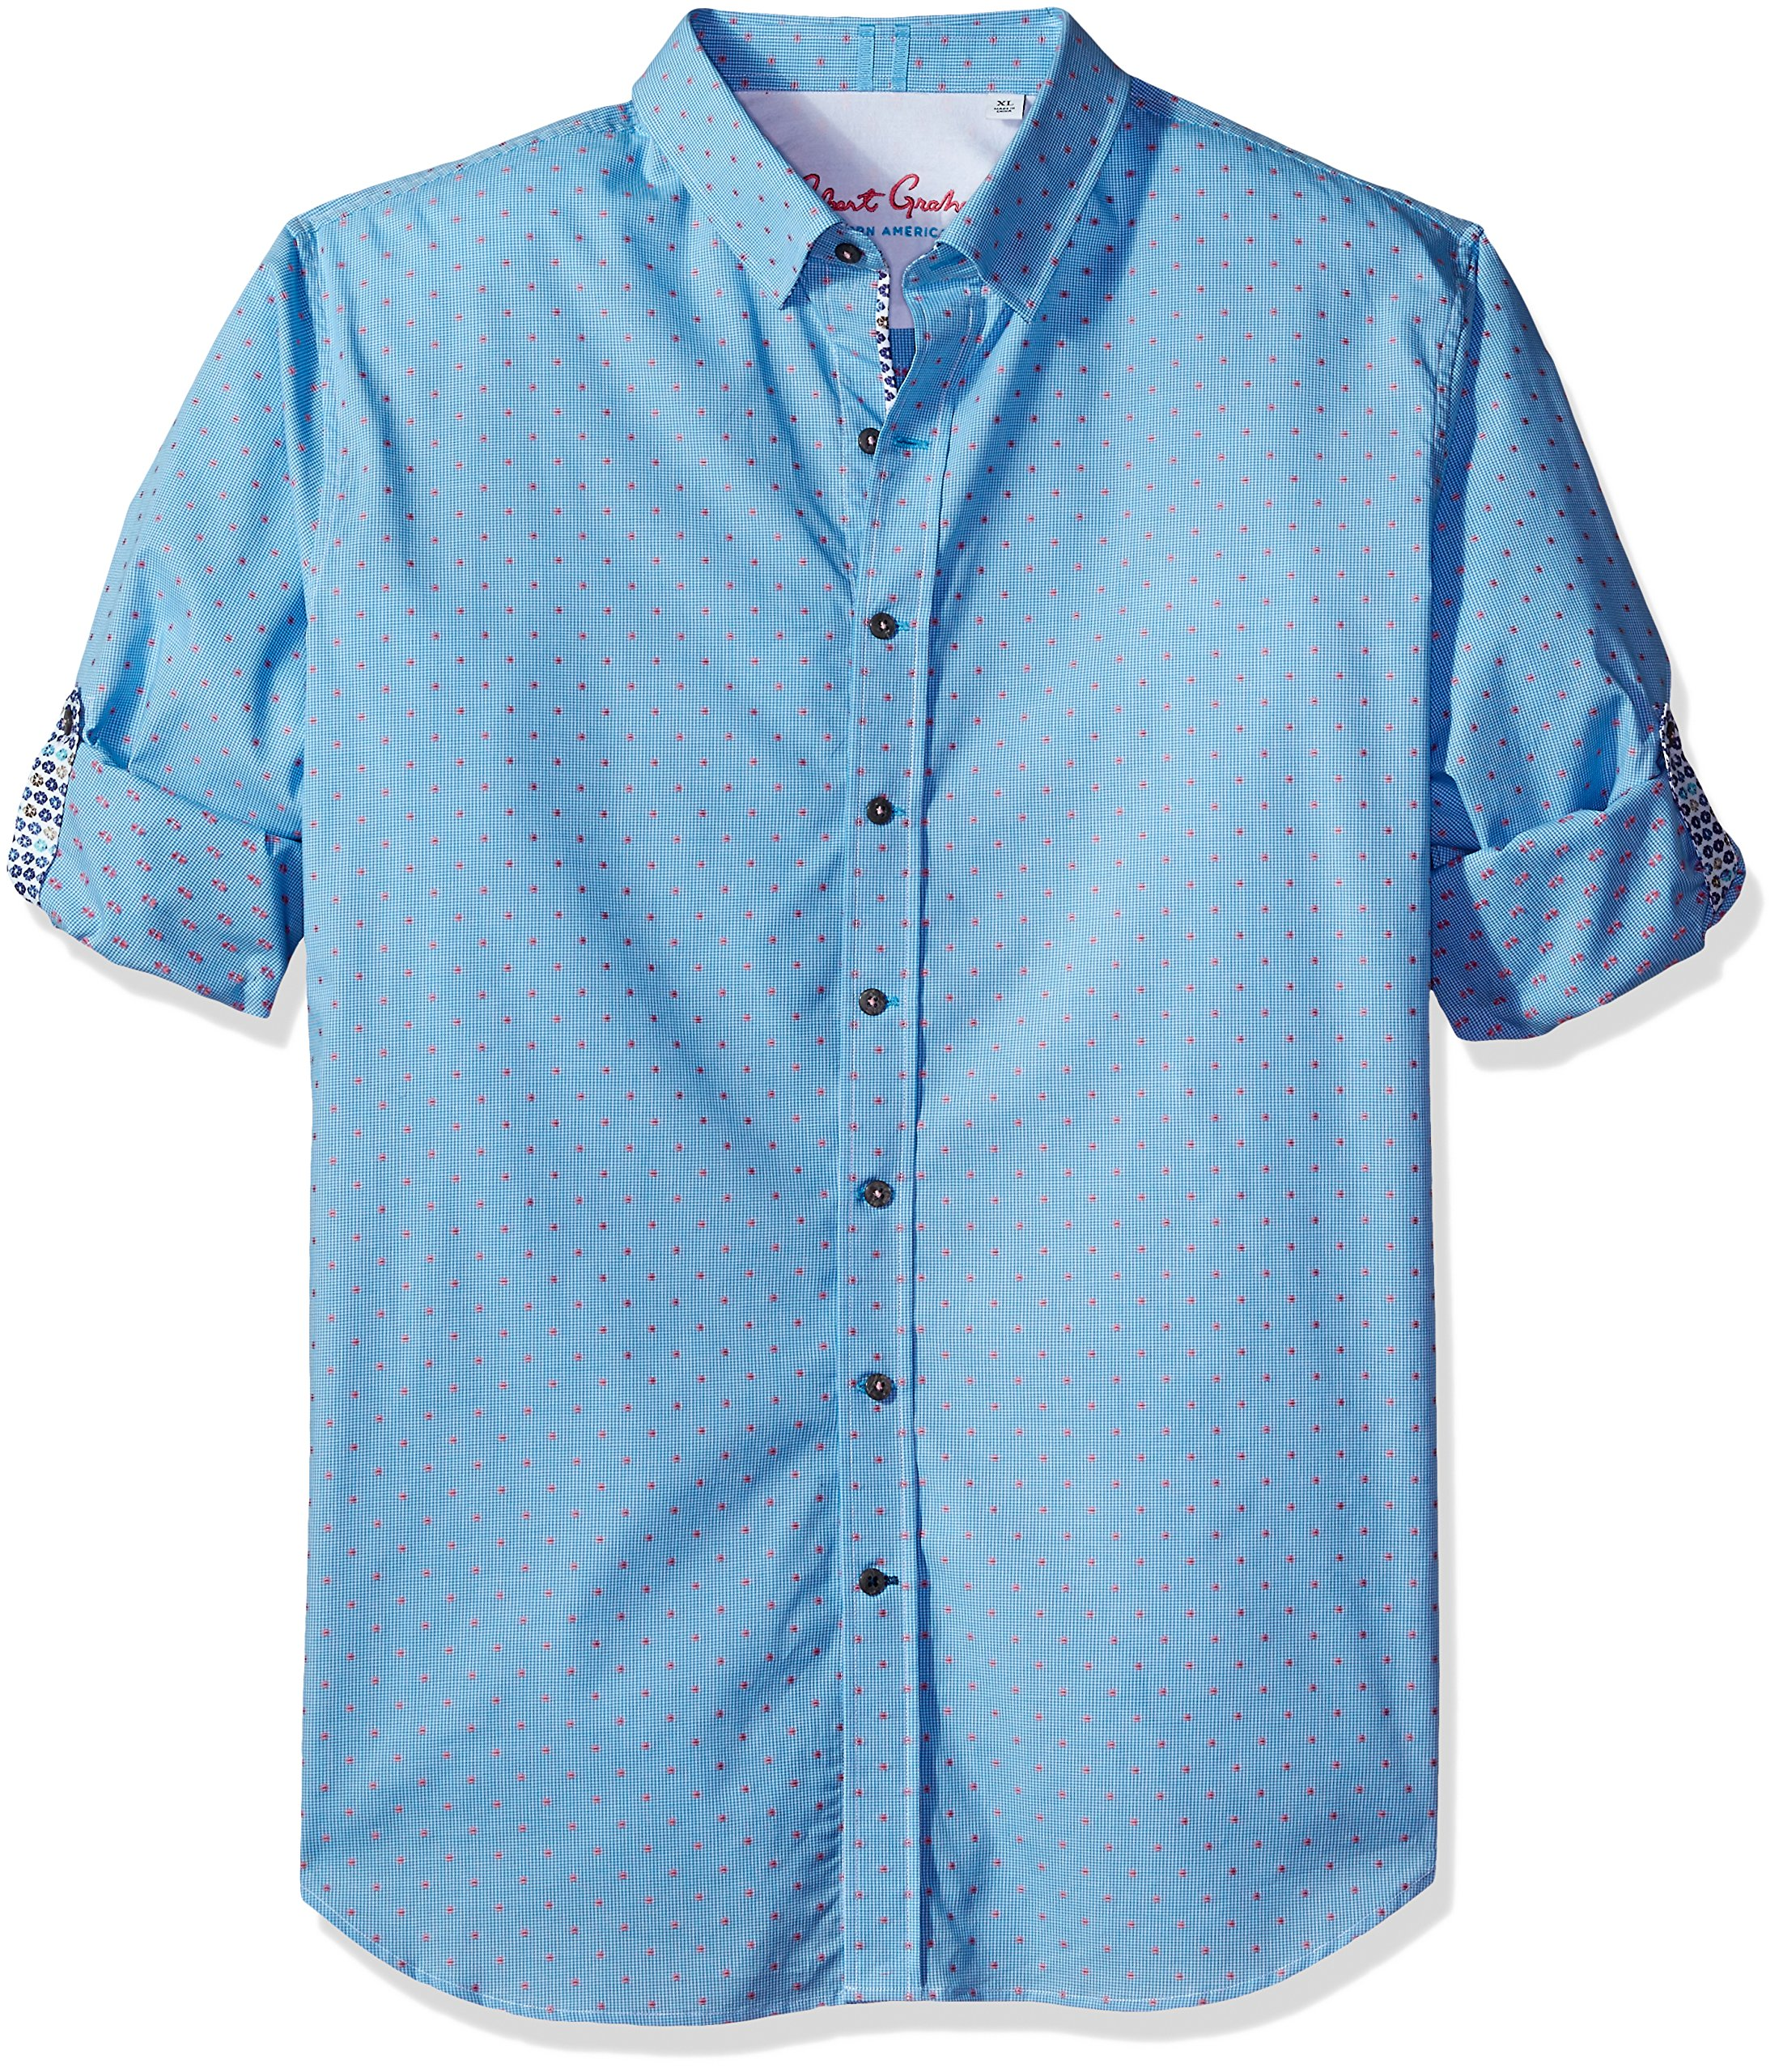 Robert Graham Men's Carlos L/s Tailored Fit Shirt, Teal 3XL